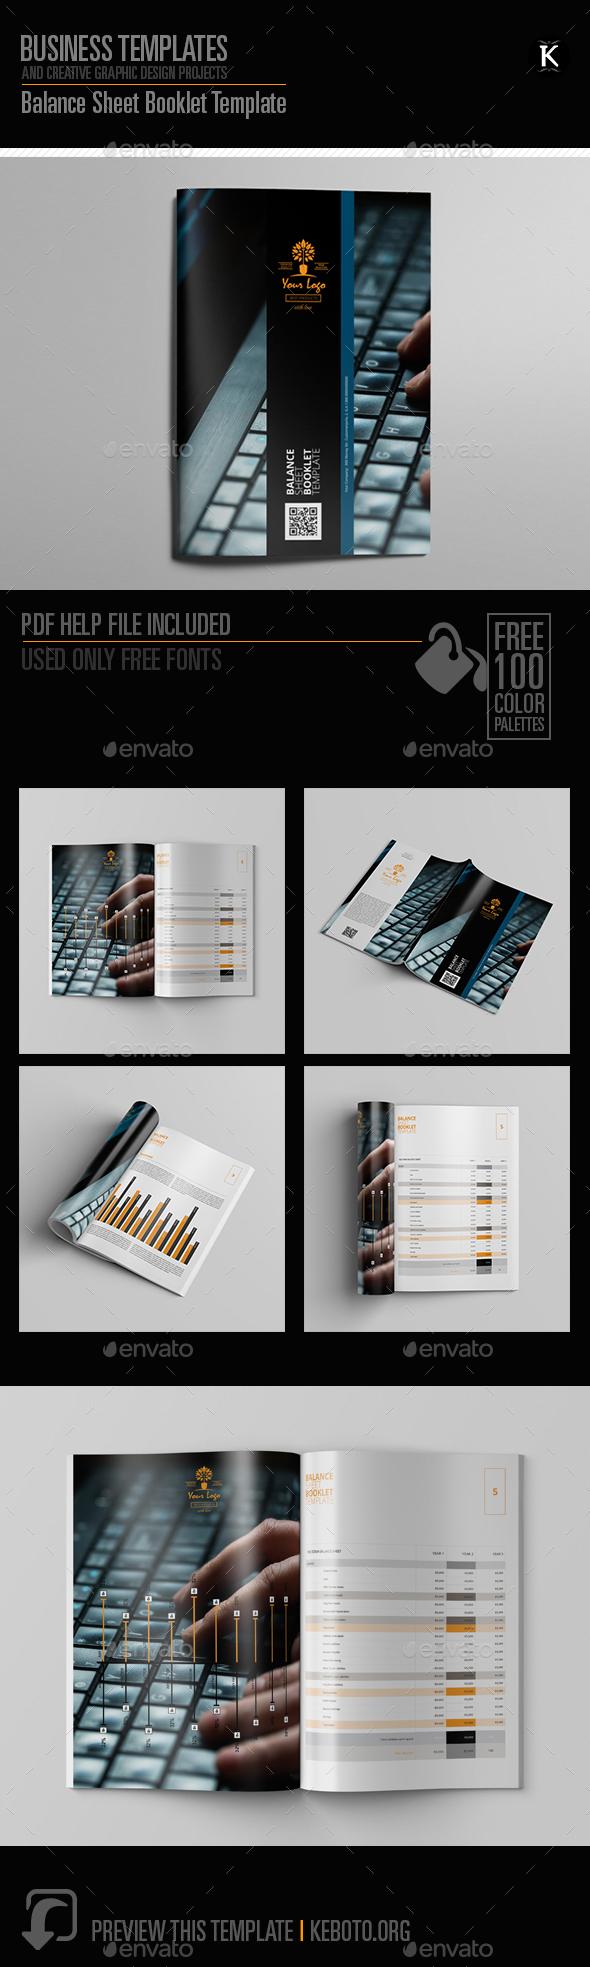 Balance Sheet Booklet Template - Miscellaneous Print Templates